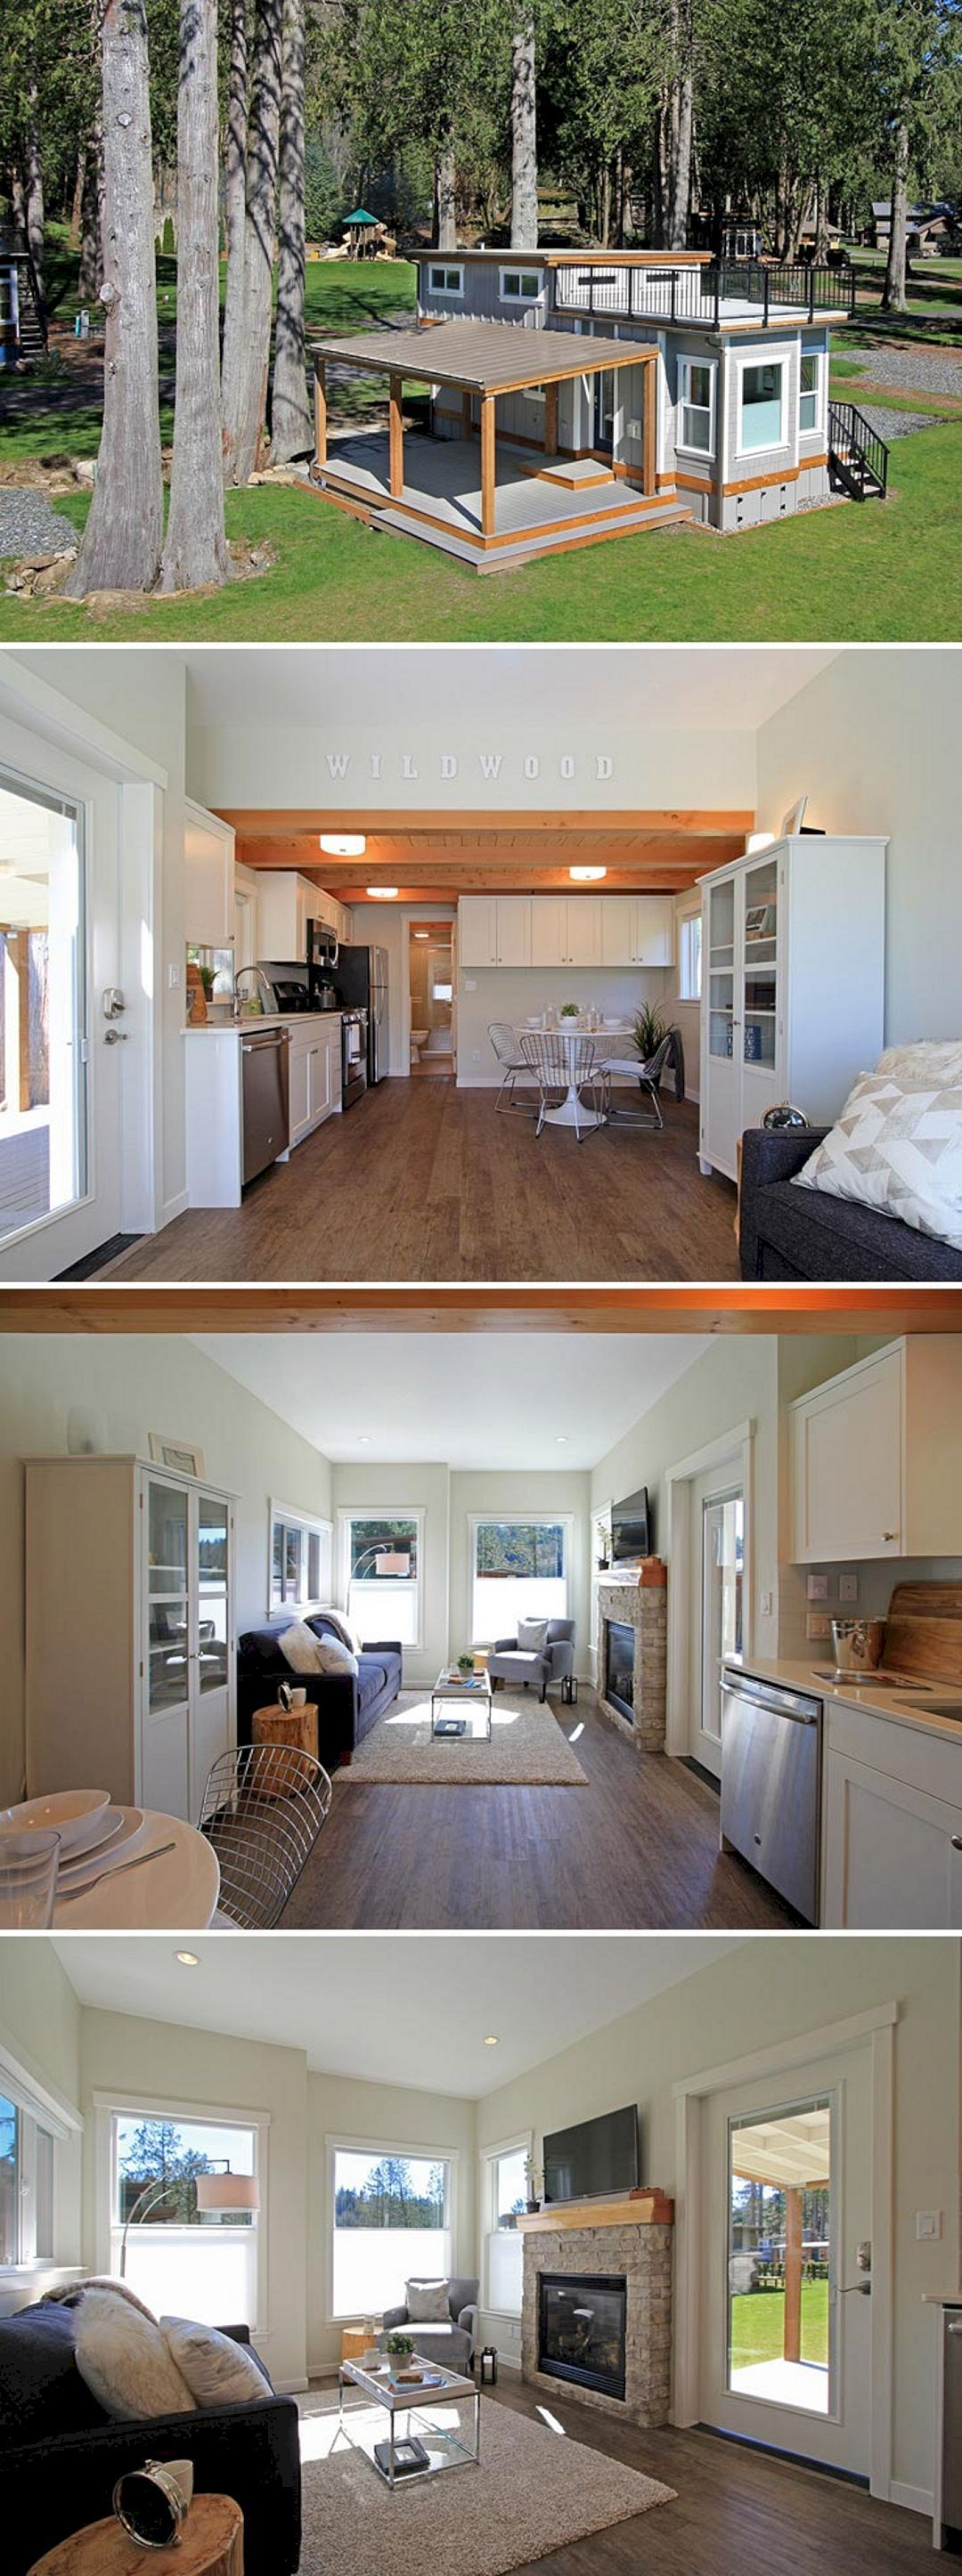 70 Marvelous Tiny Houses Design That Maximize Style And Function.  BauanleitungKleines HäuschenWohnwagenUmbauHaus ...